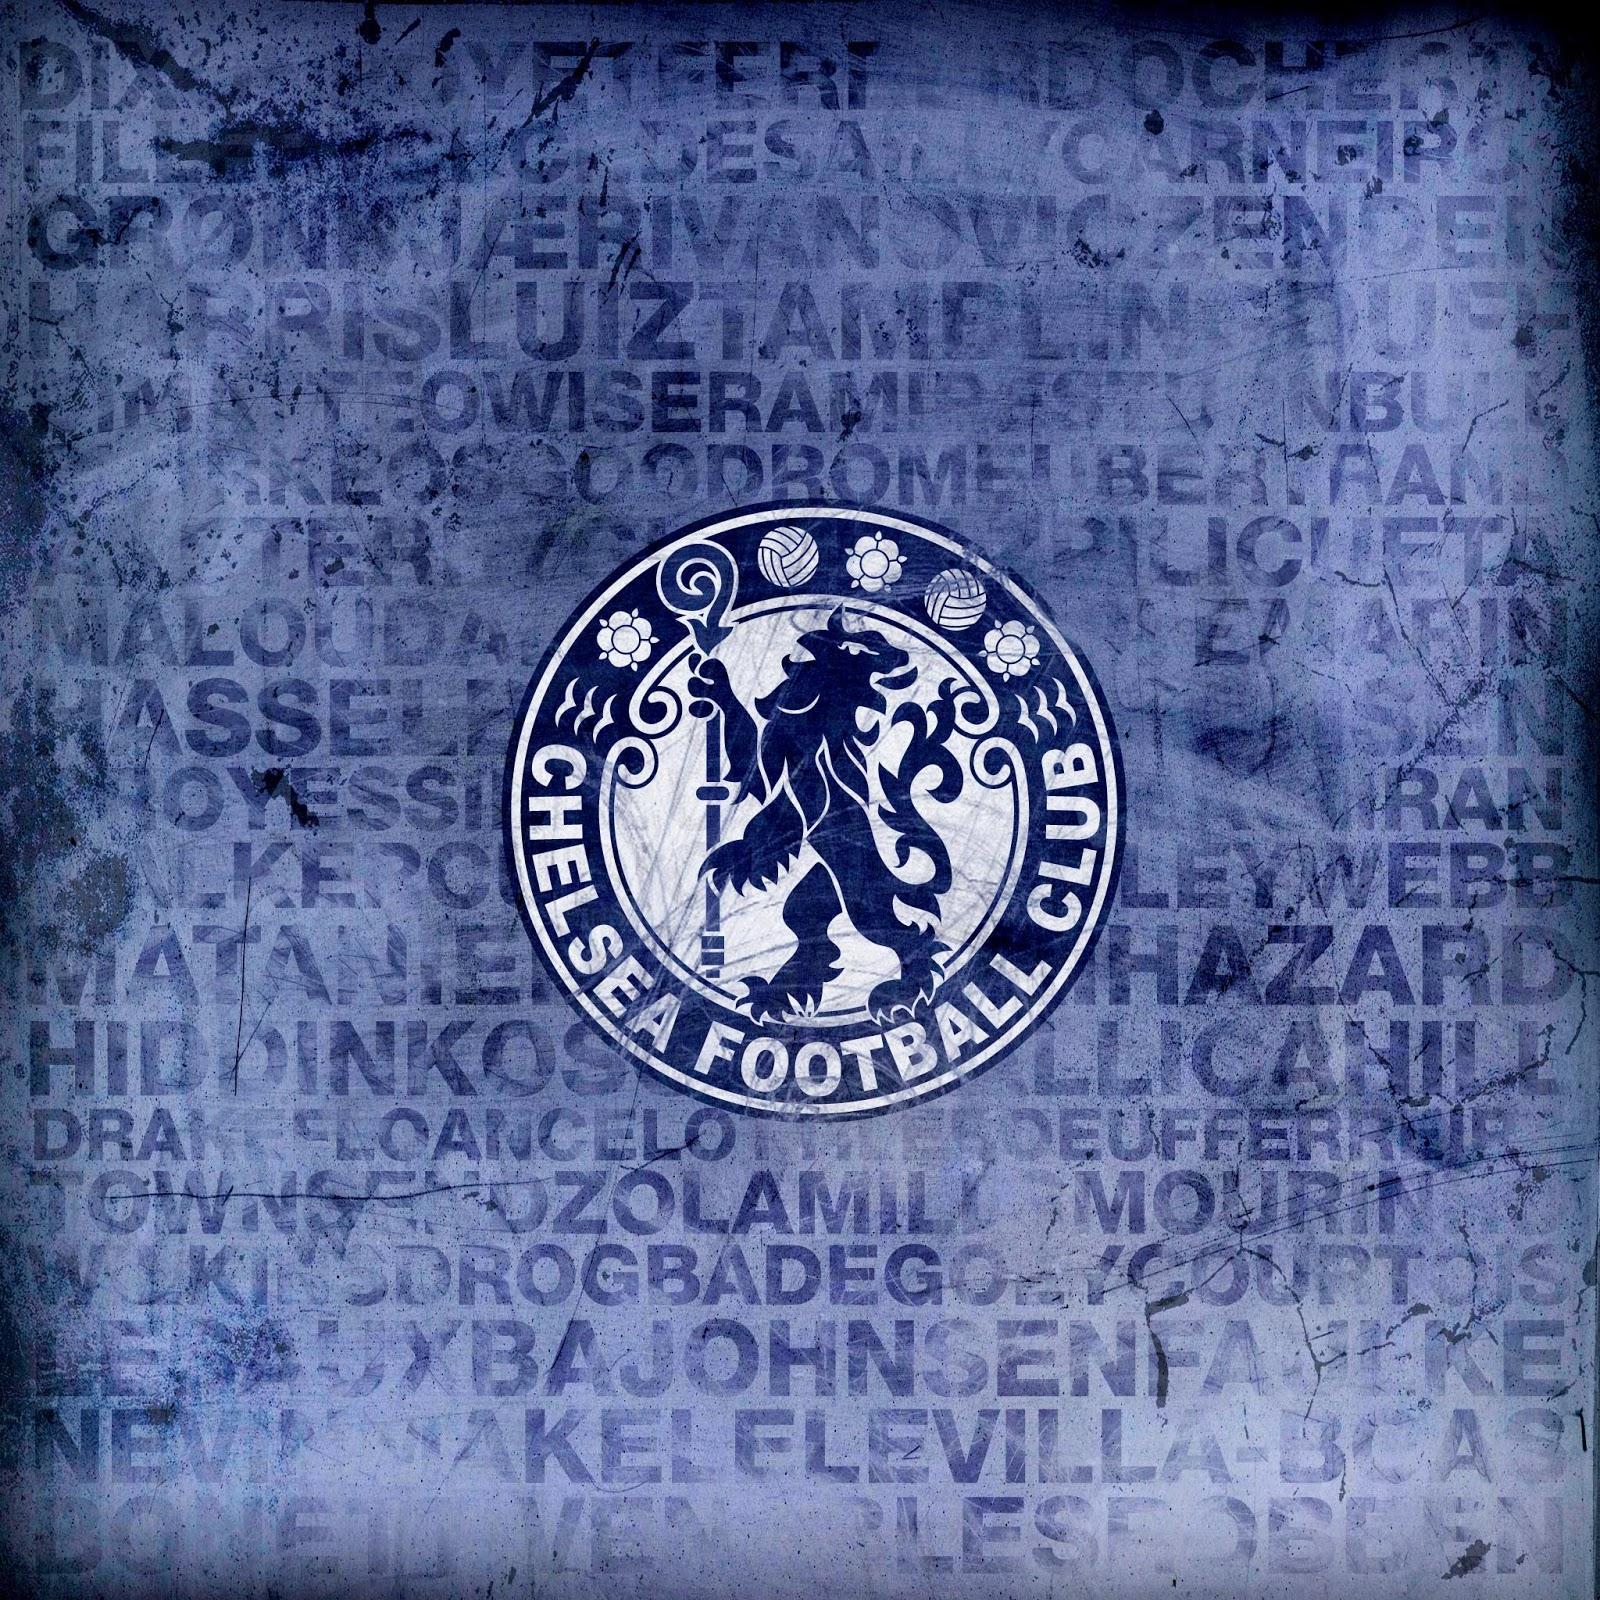 Chelsea Football Club Wallpaper